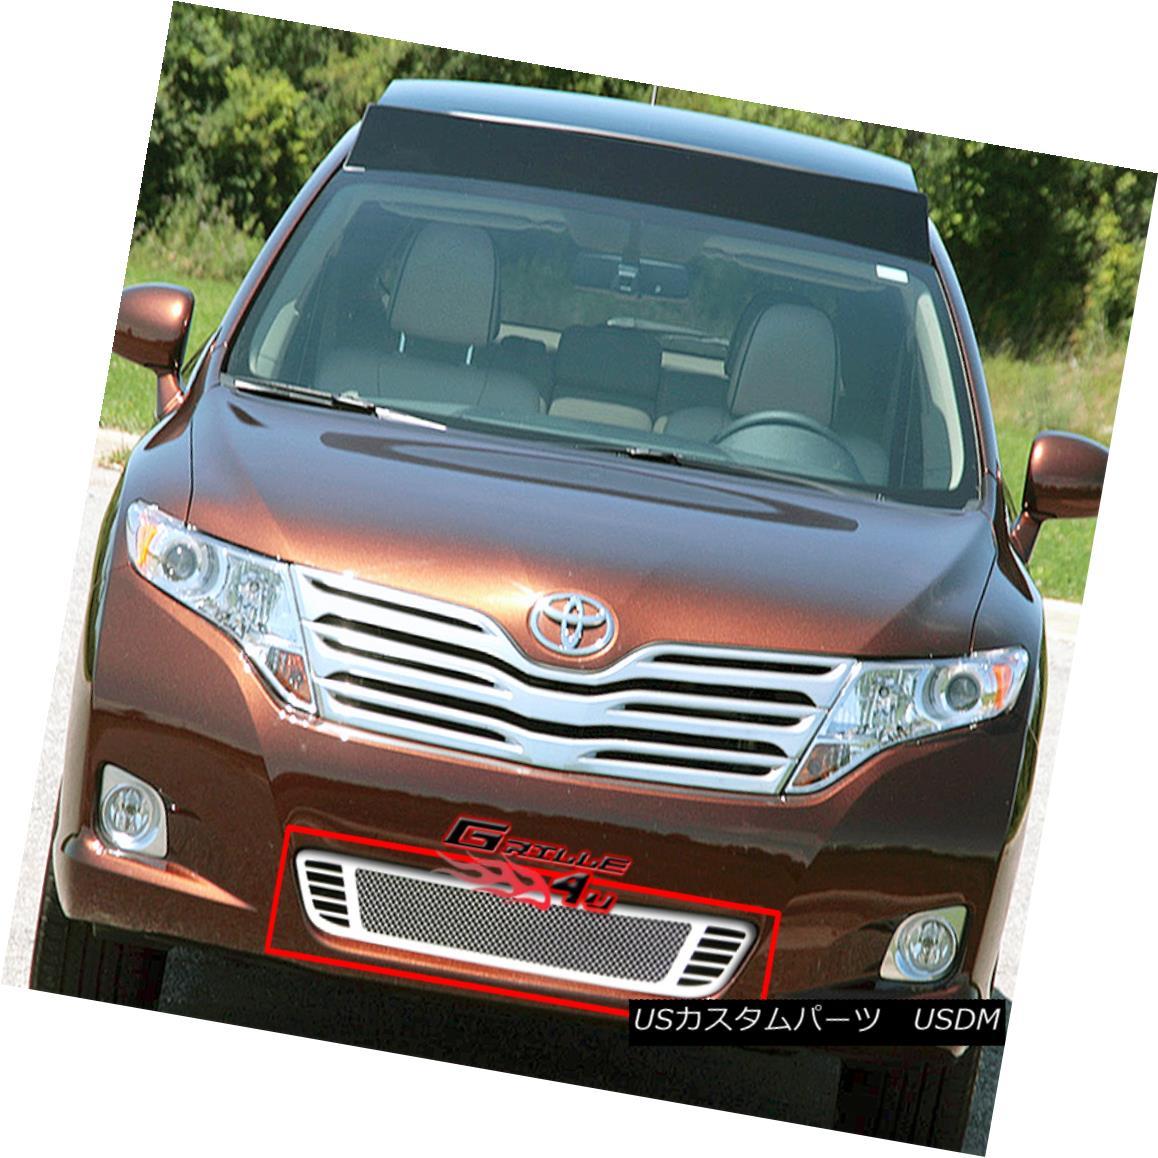 USグリル Fits 2009-2011 Toyota Venza Bumper Stainless Mesh Grille フィット2009-2011トヨタベンザバンパーステンレスメッシュグリル